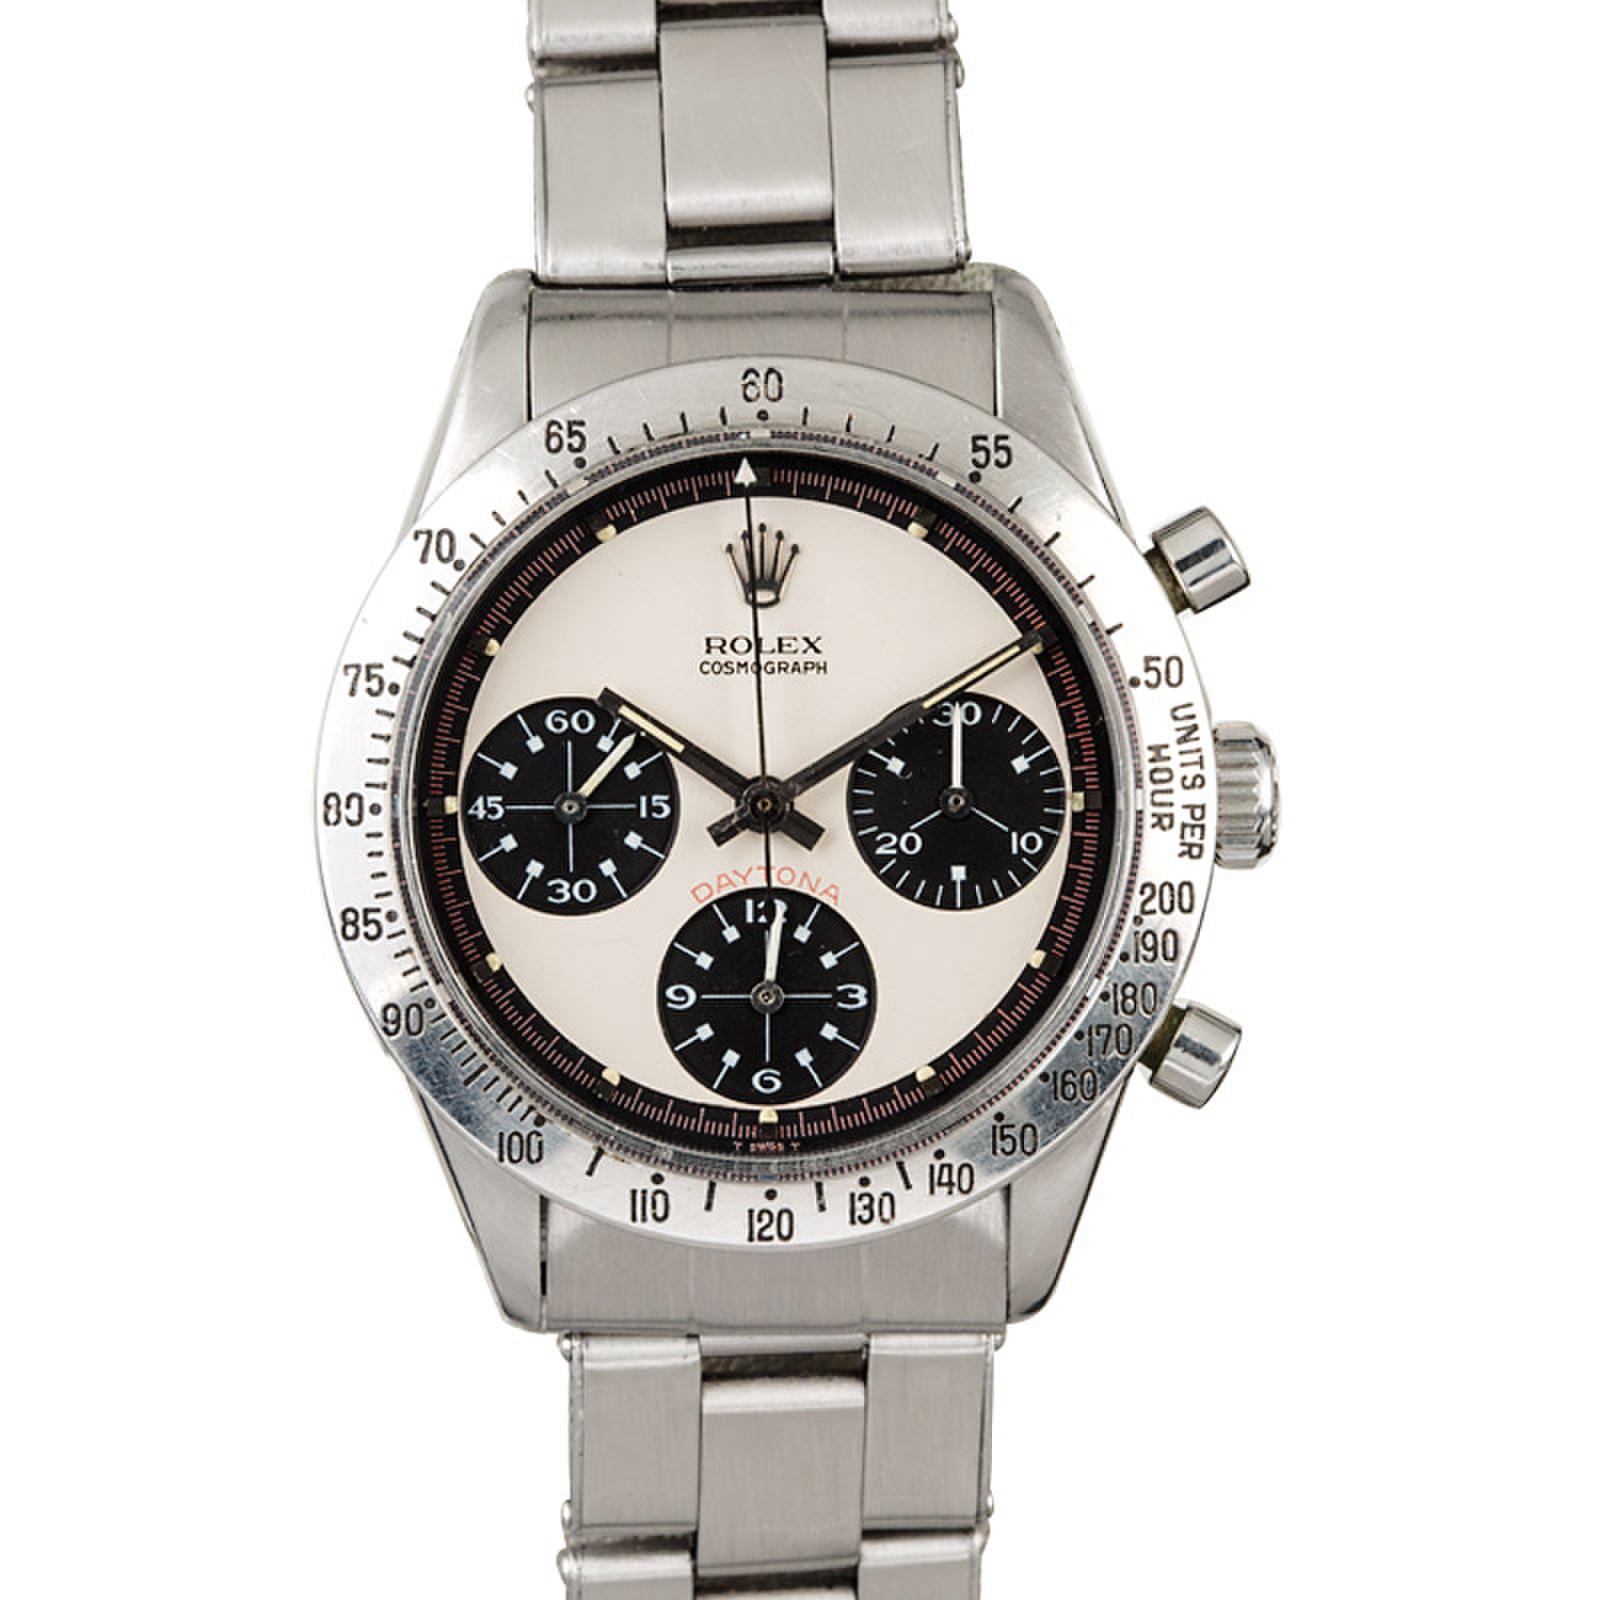 Auction Vintage Rolex Daytona 6239 Bob S Watches